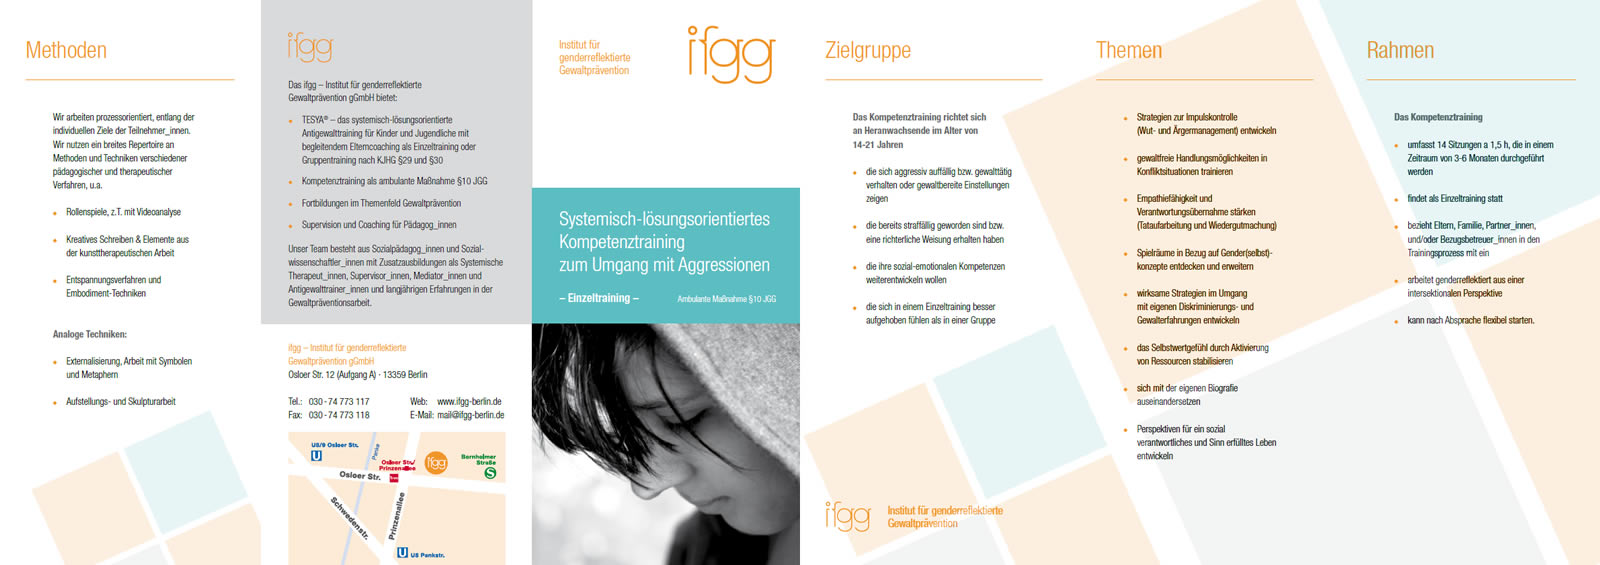 Flyer Kompetenztraining Einzeltraining ifgg ambulante Massnahme JGG §10g